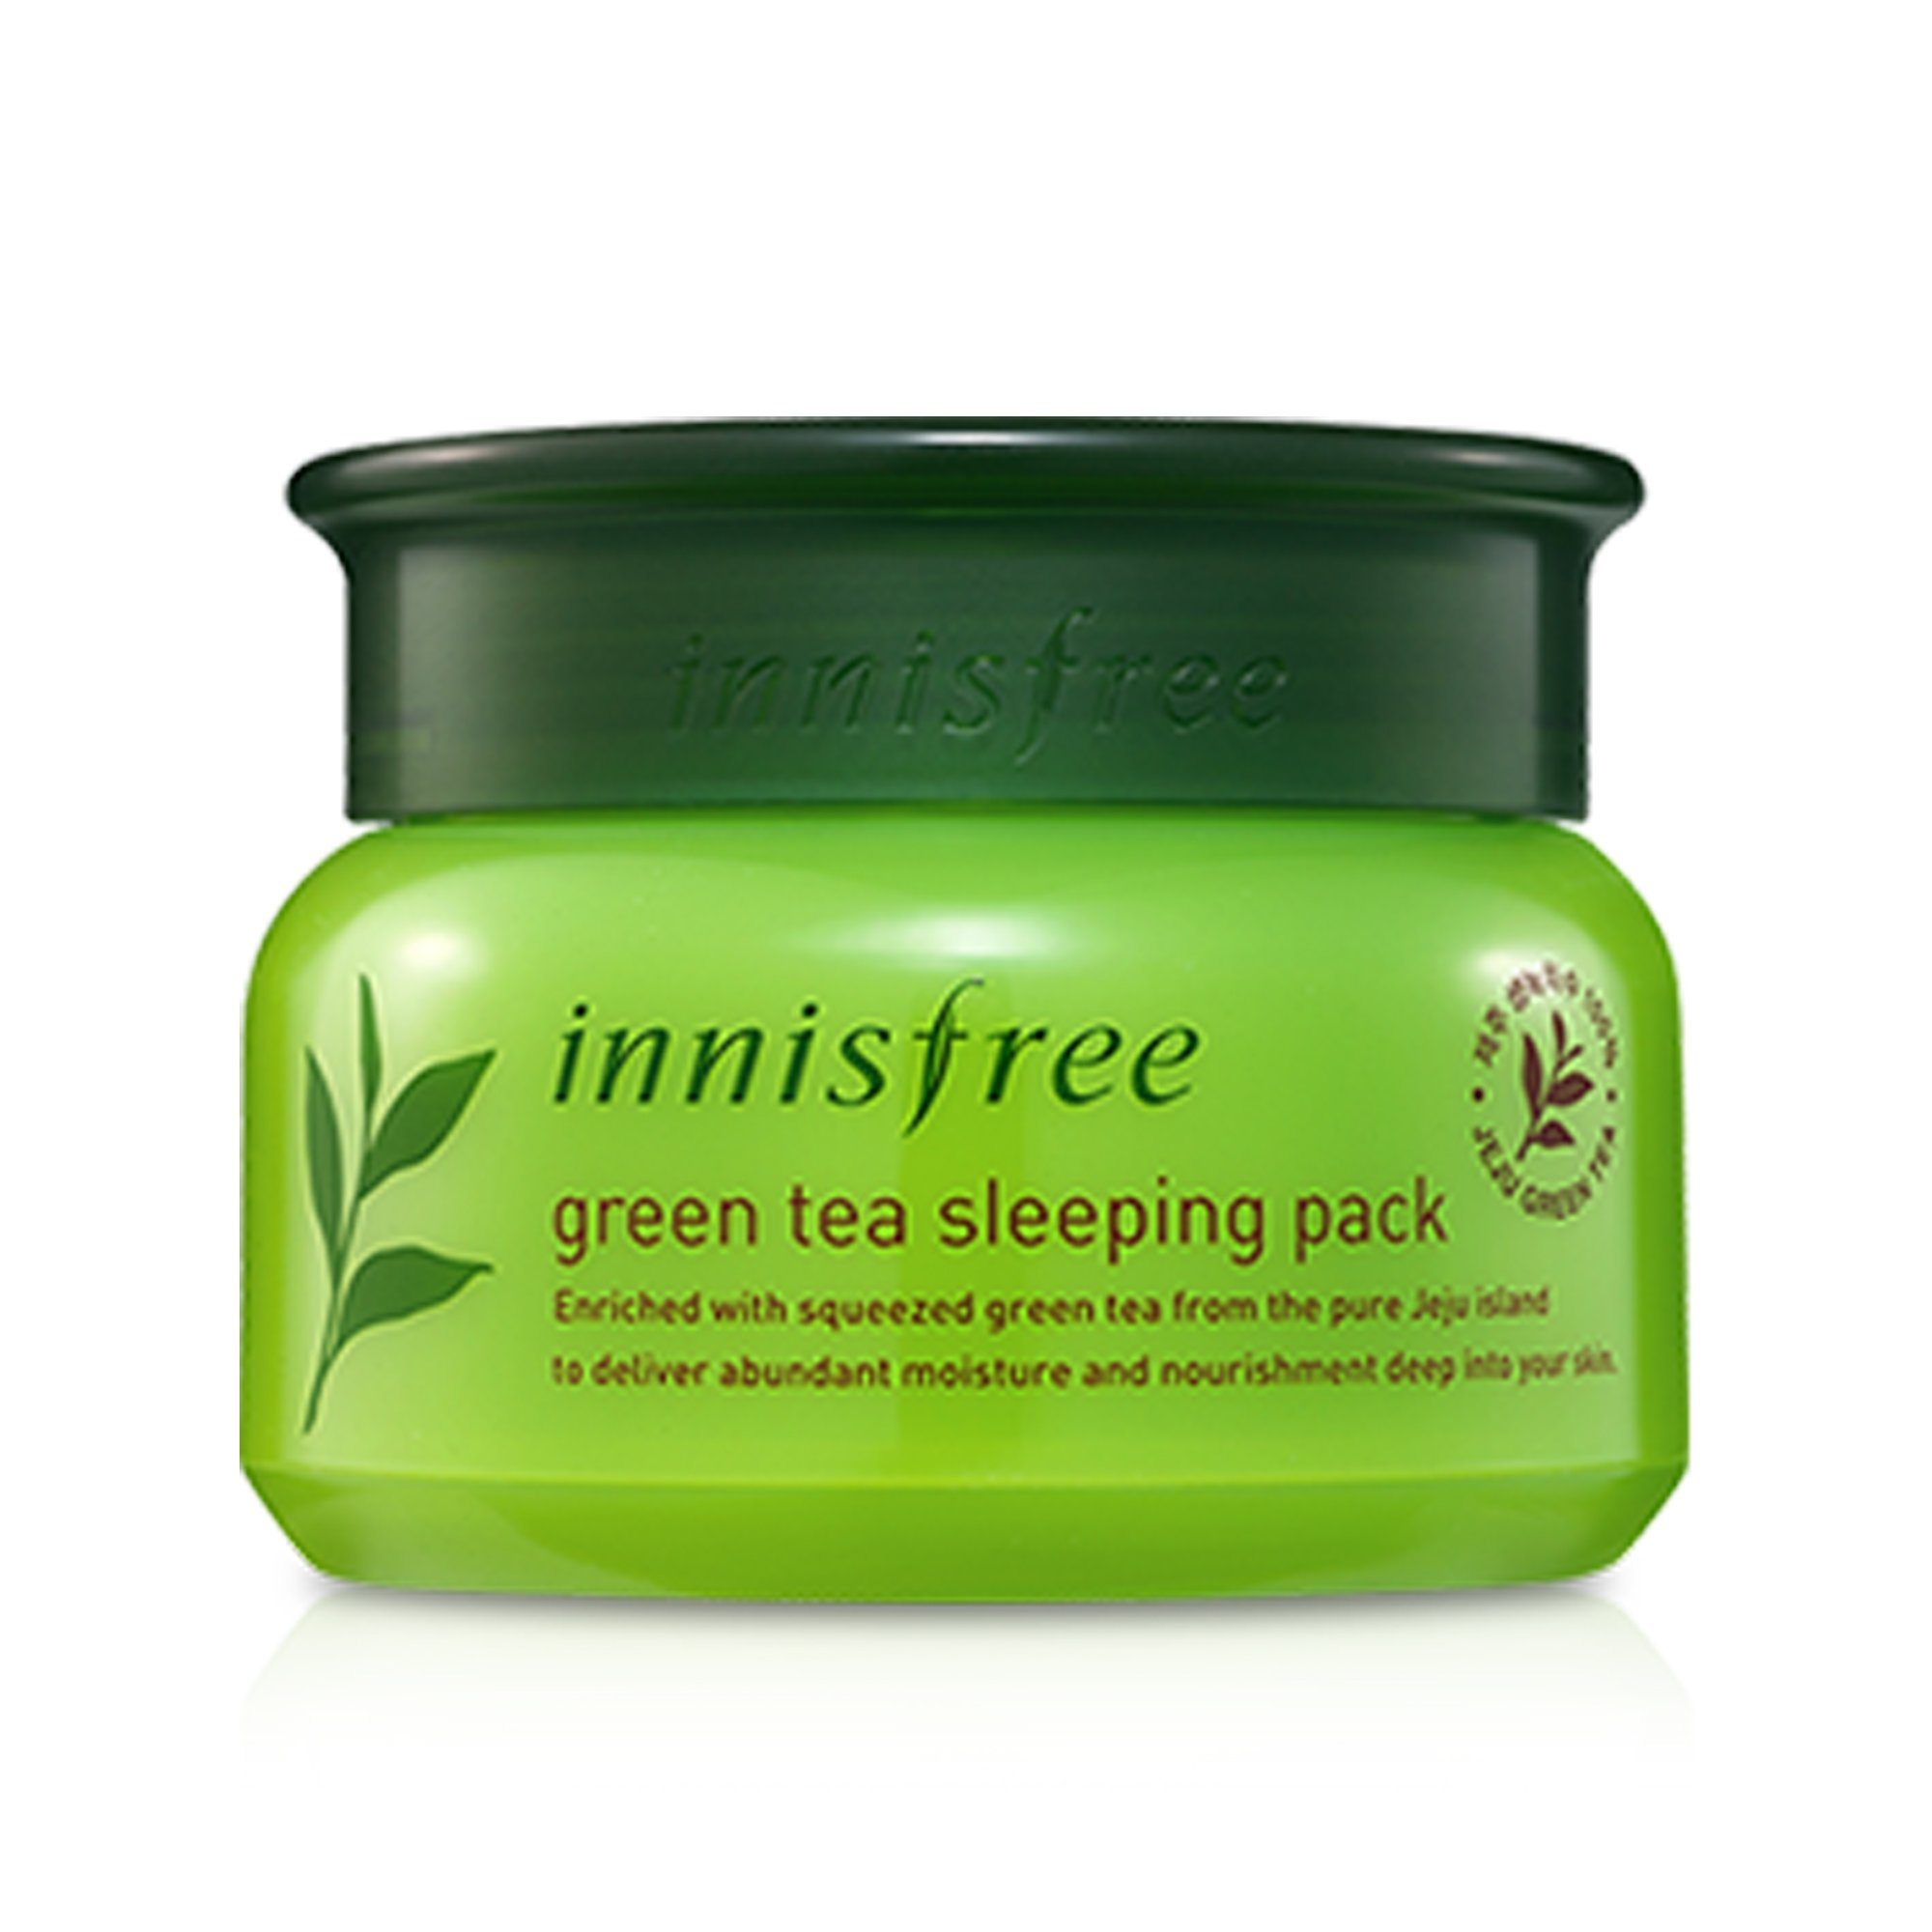 mat-na-ngu-innisfree-green-tea-sleeping-pack-review-thanh-phan-gia-cong-dung-28